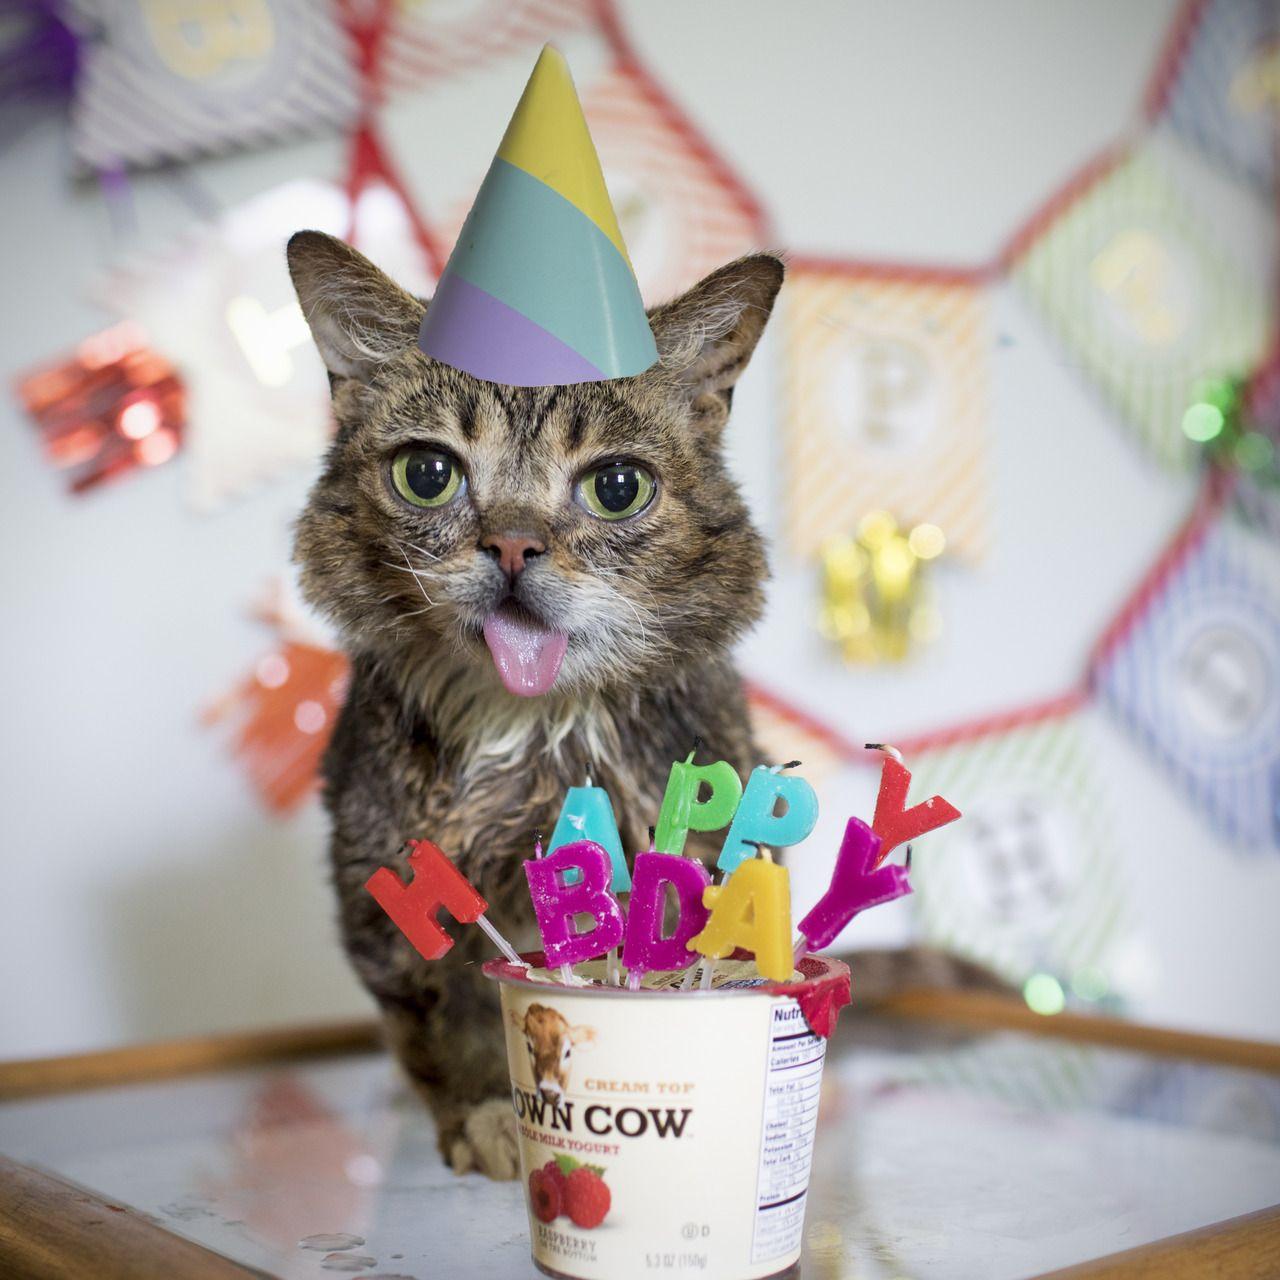 Celebrating 7 Years Of Science Magic And Inspiration Happy Birthday Bub Cat Birthday Bub The Cat Internet Cats